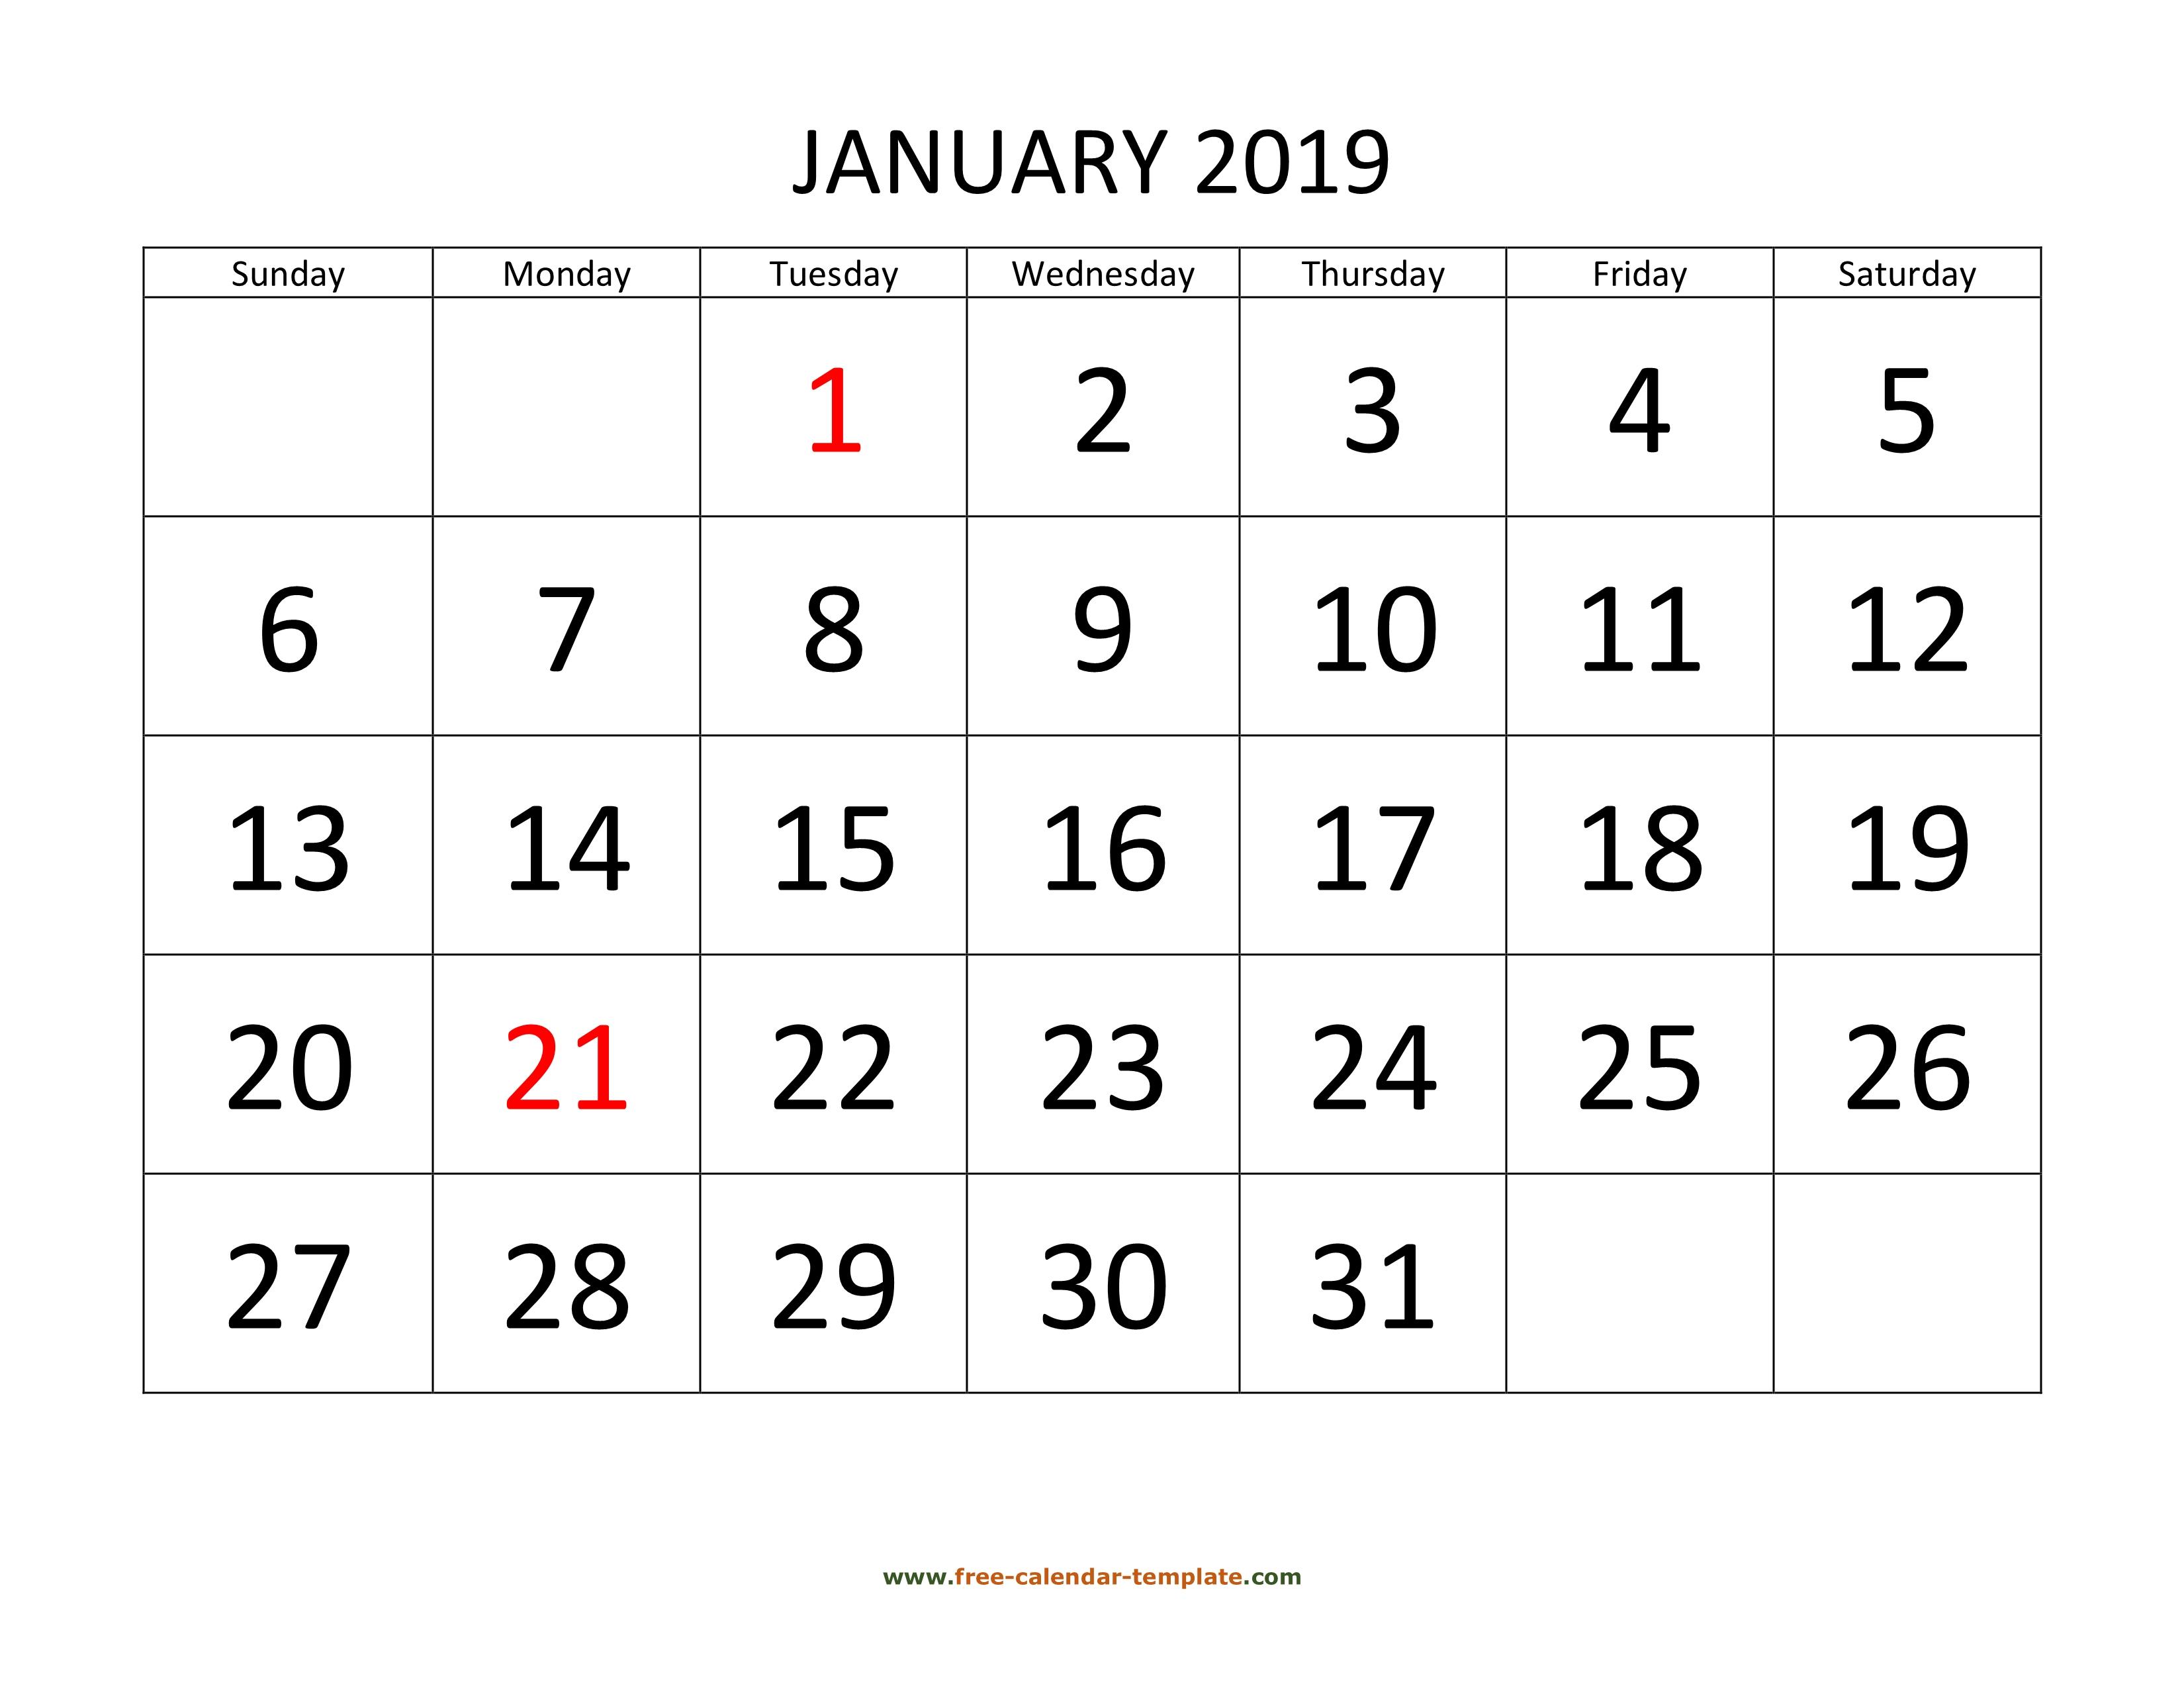 Printable Monthly Calendar 2019 | Freecalendartemplate regarding Printable Calendar 2020 3 Months Per Page